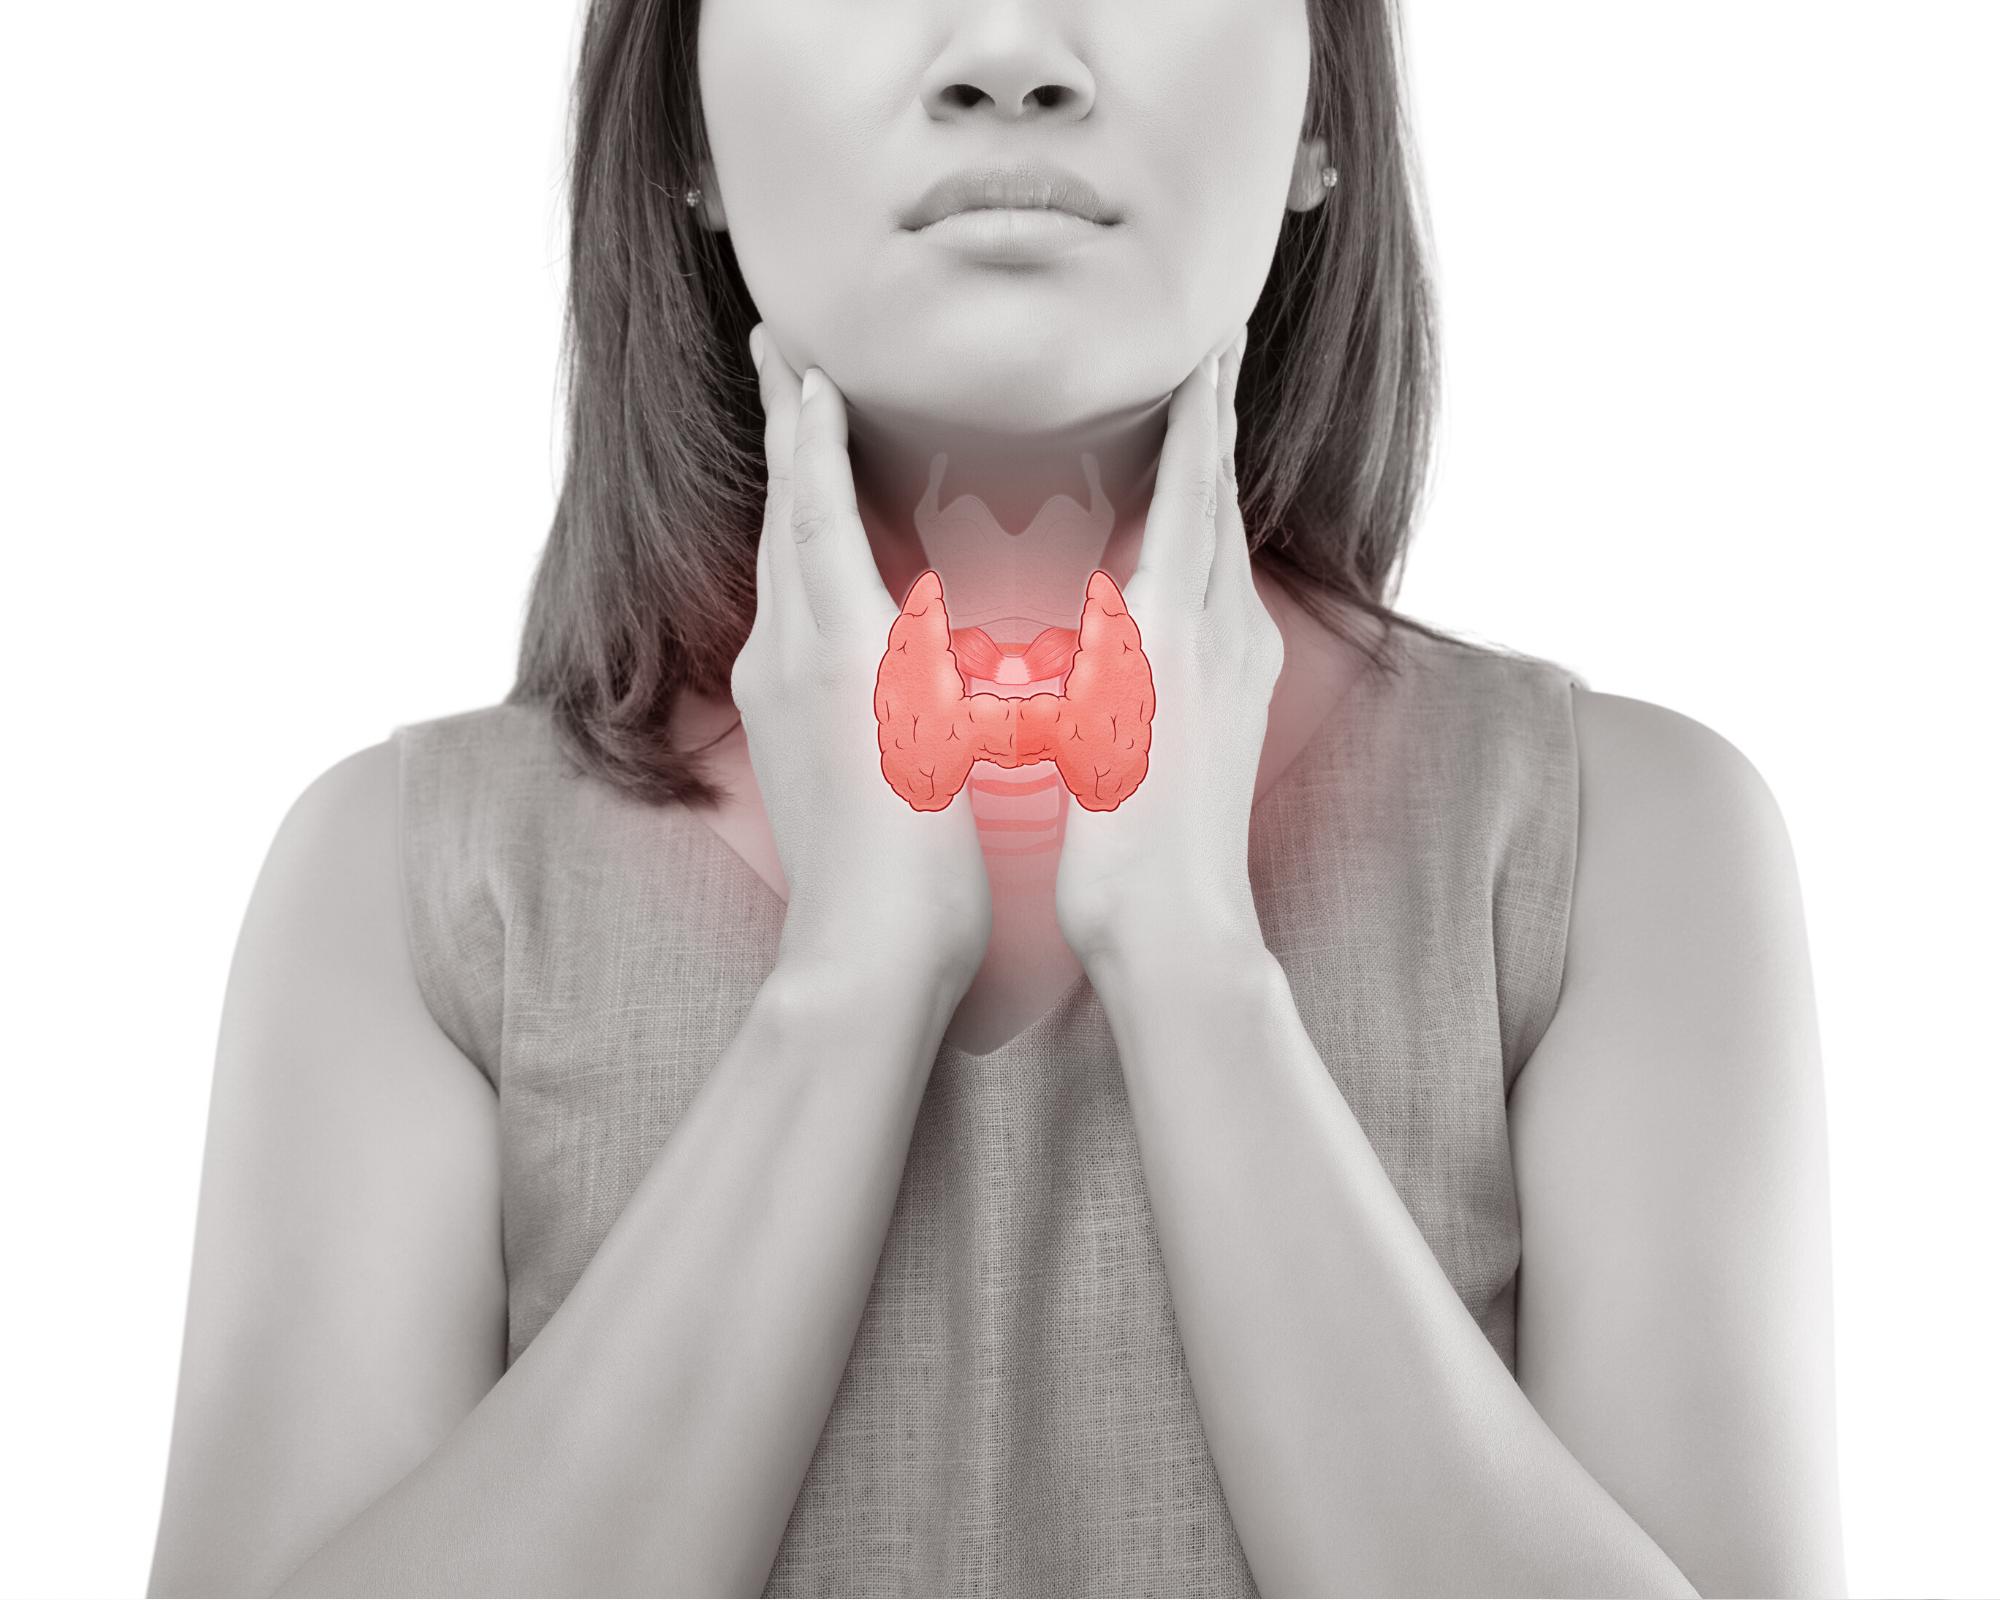 Women clenching her thyroid